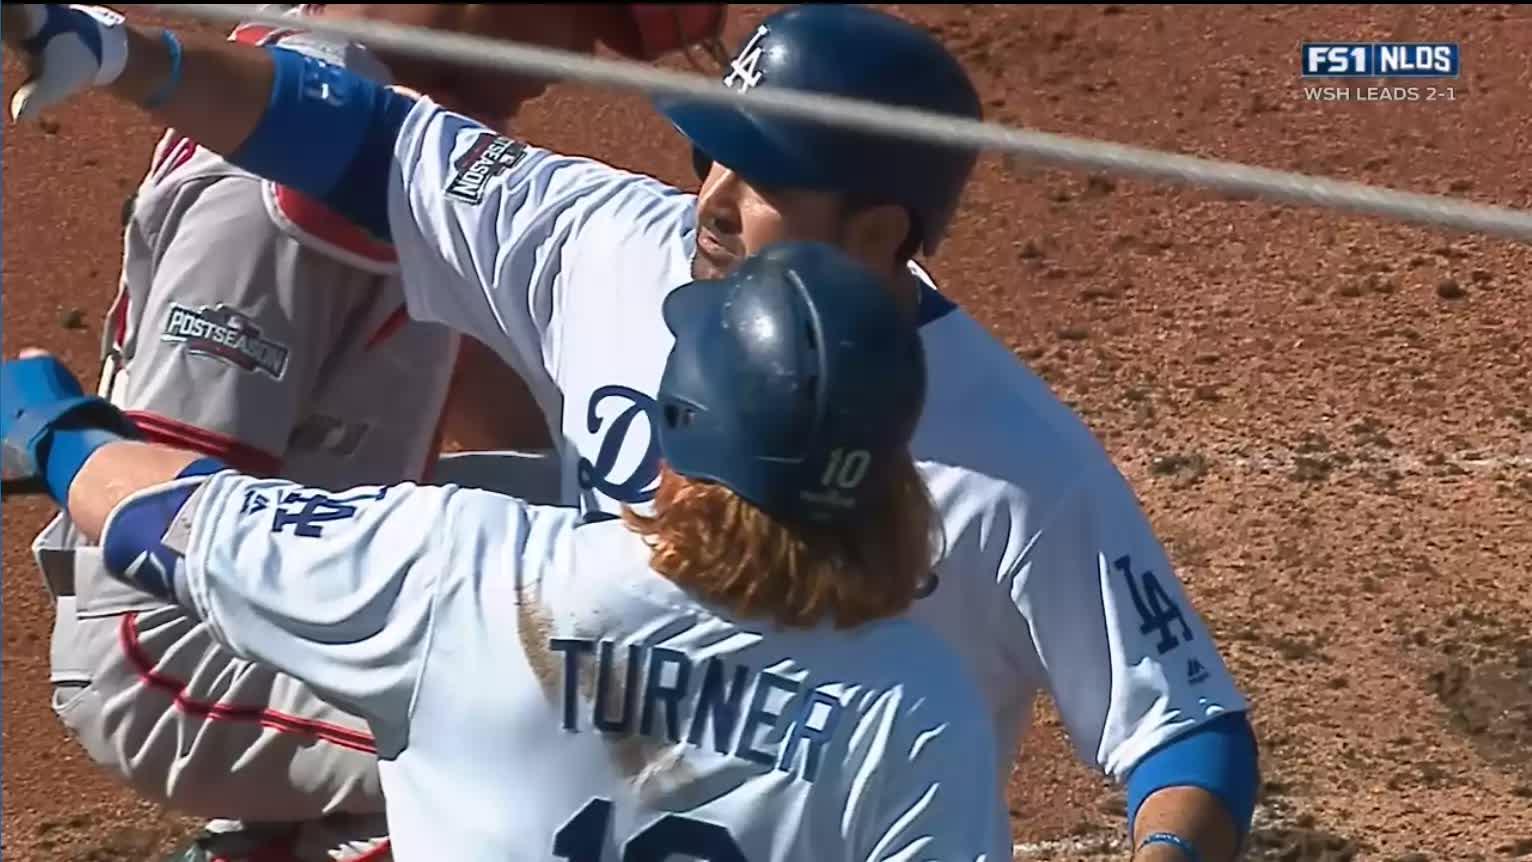 Dodgers selfie GIFs